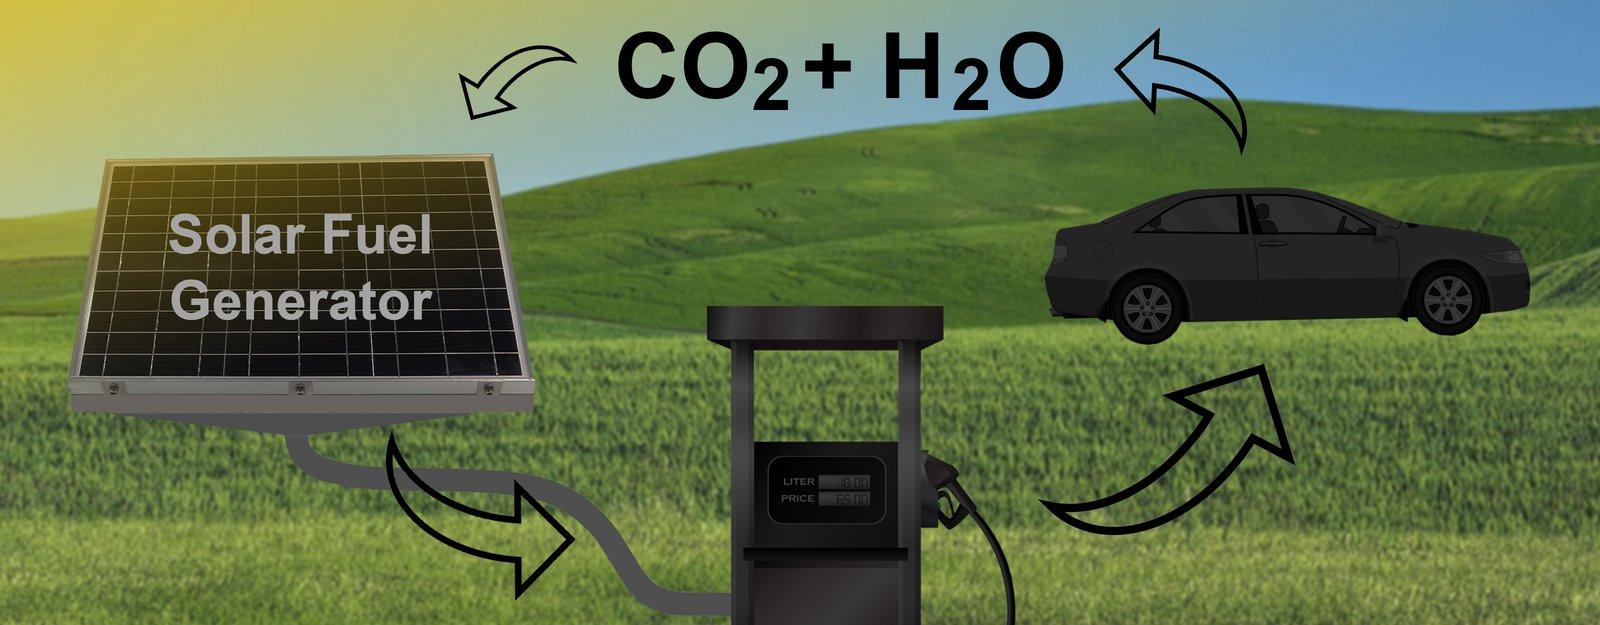 renewable solar fuel